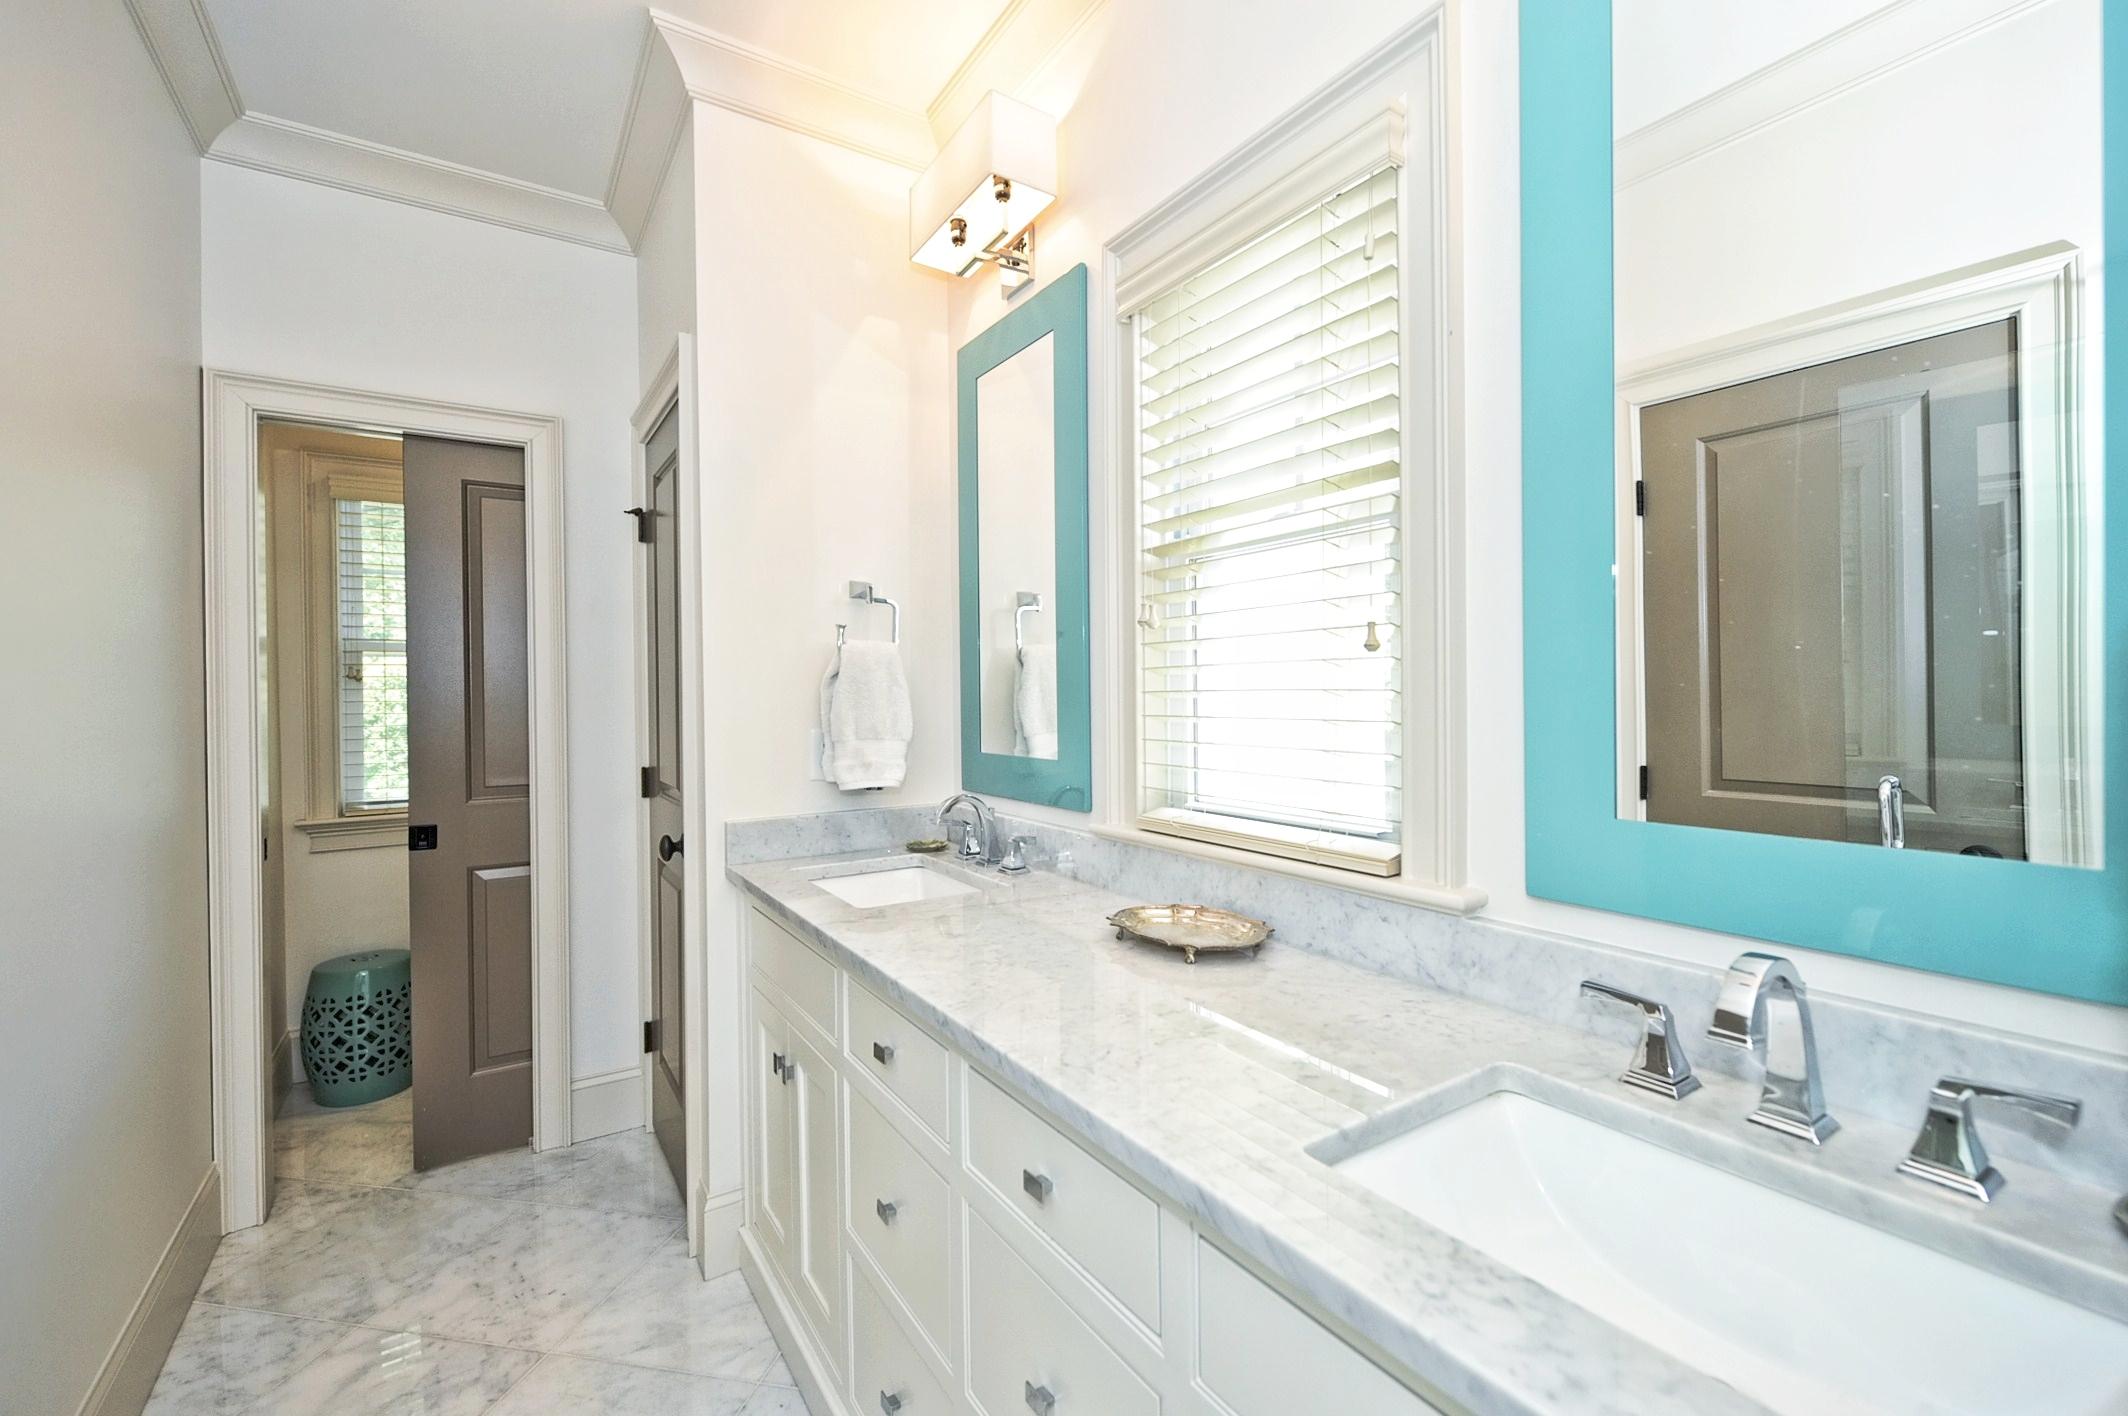 026_Master Bathroom.jpg